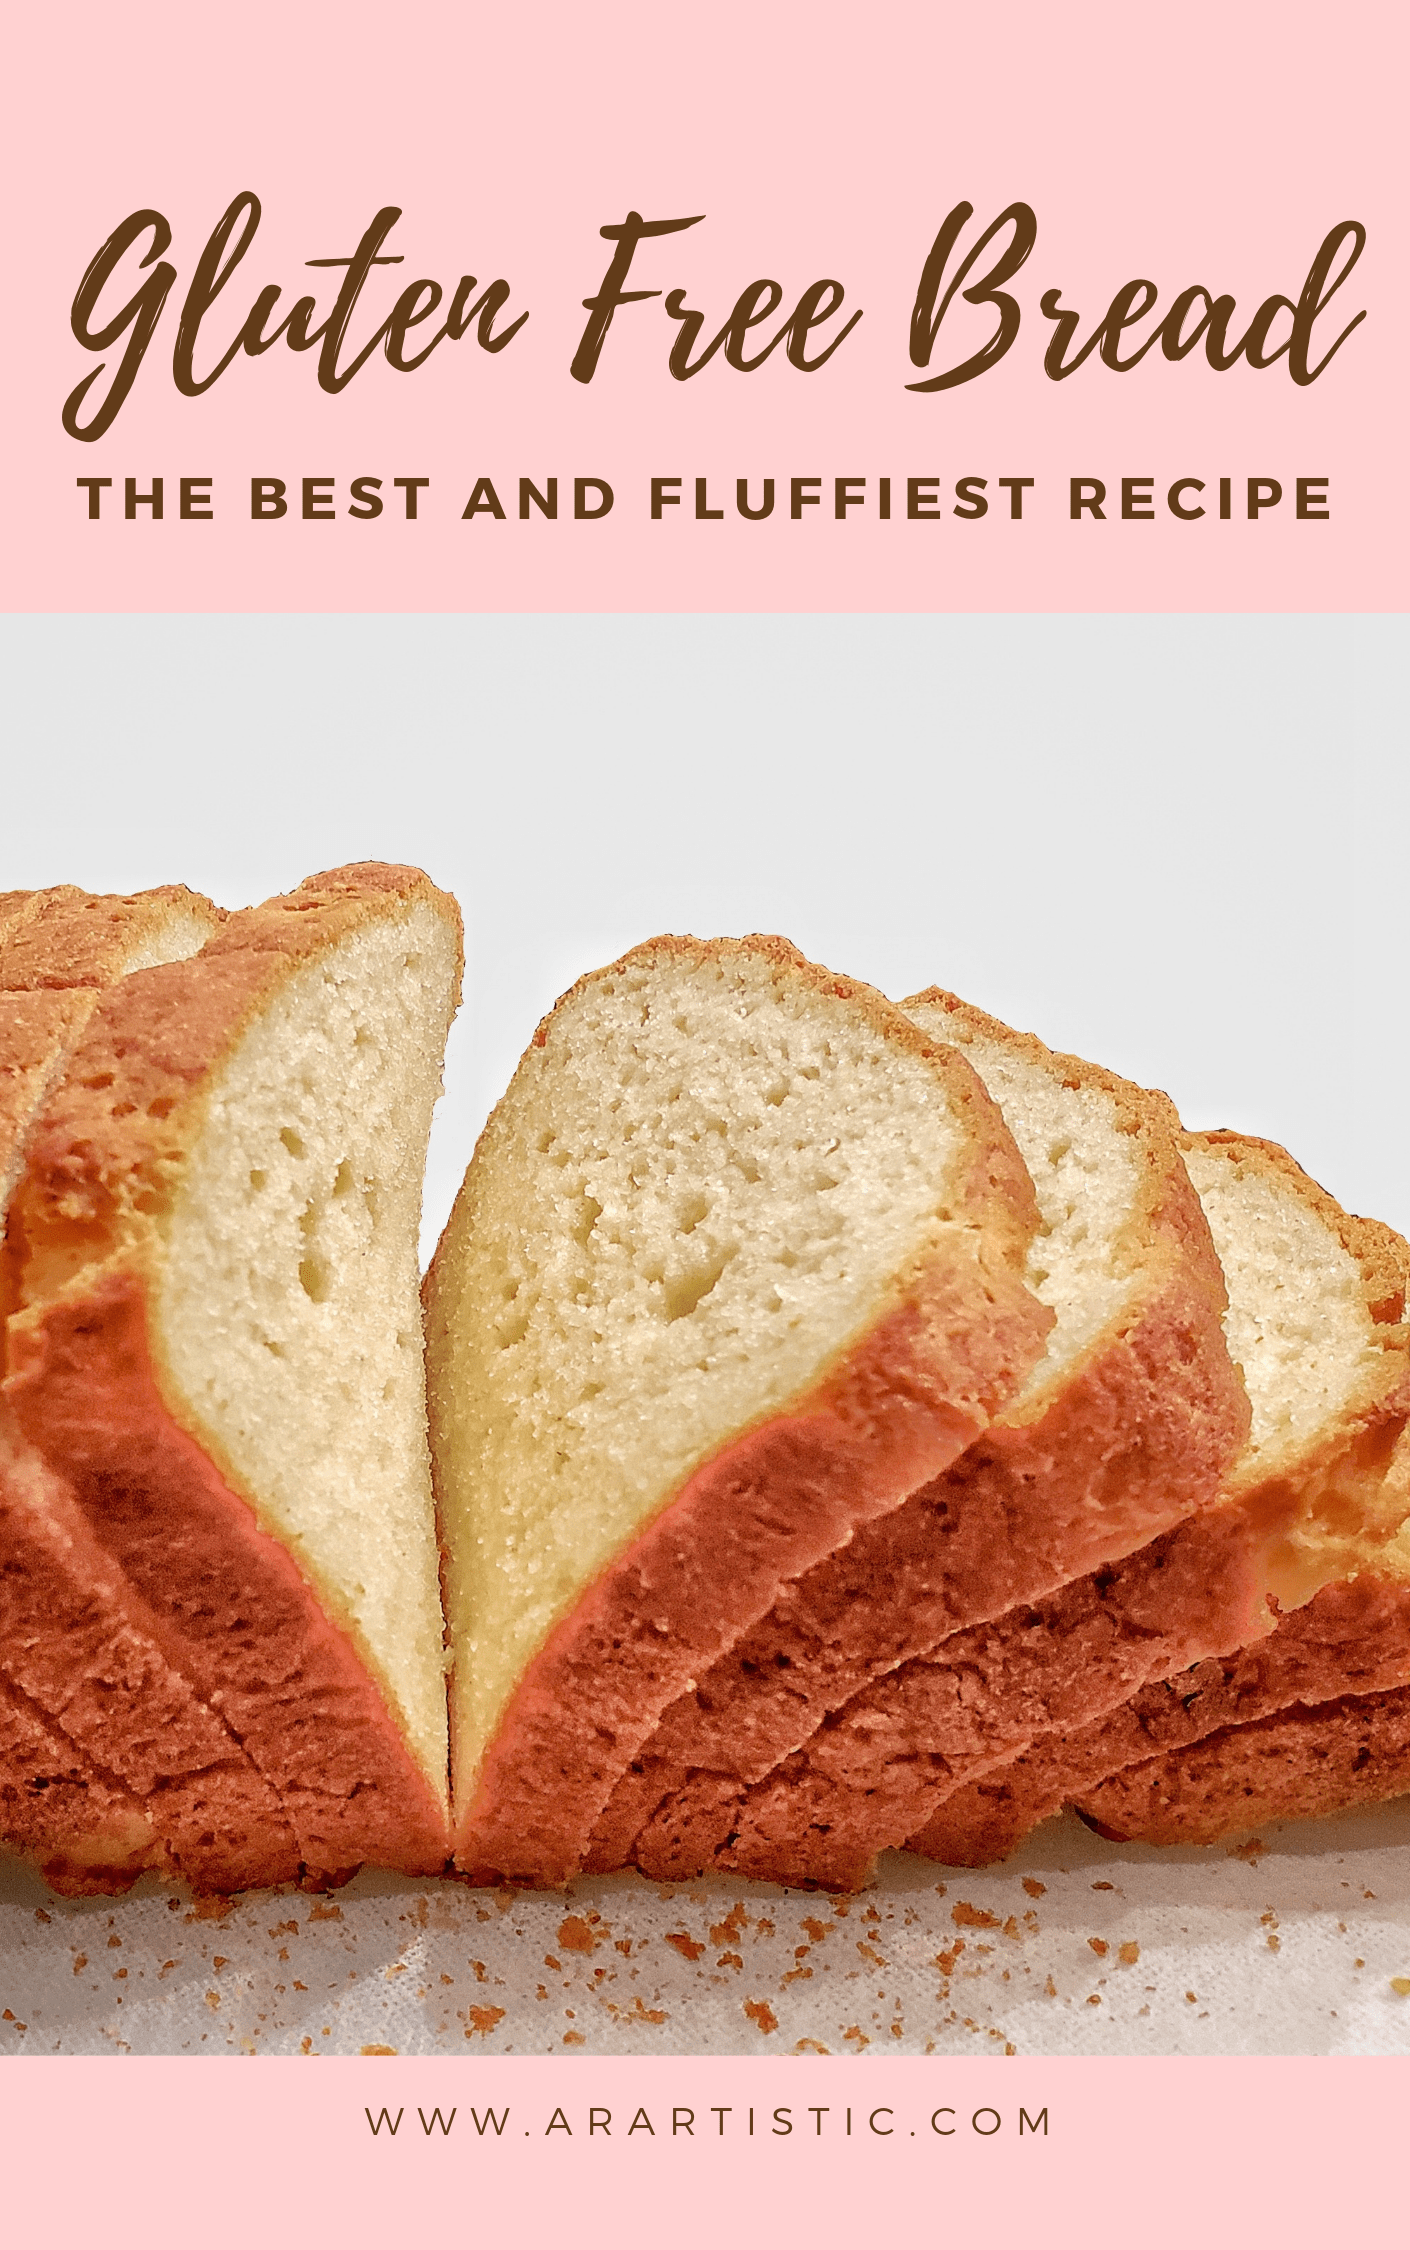 The Best Gluten Free Bread Recipe Beyond The Slice Recipe In 2020 Best Gluten Free Bread Gluten Free Recipes Easy Good Gluten Free Bread Recipe